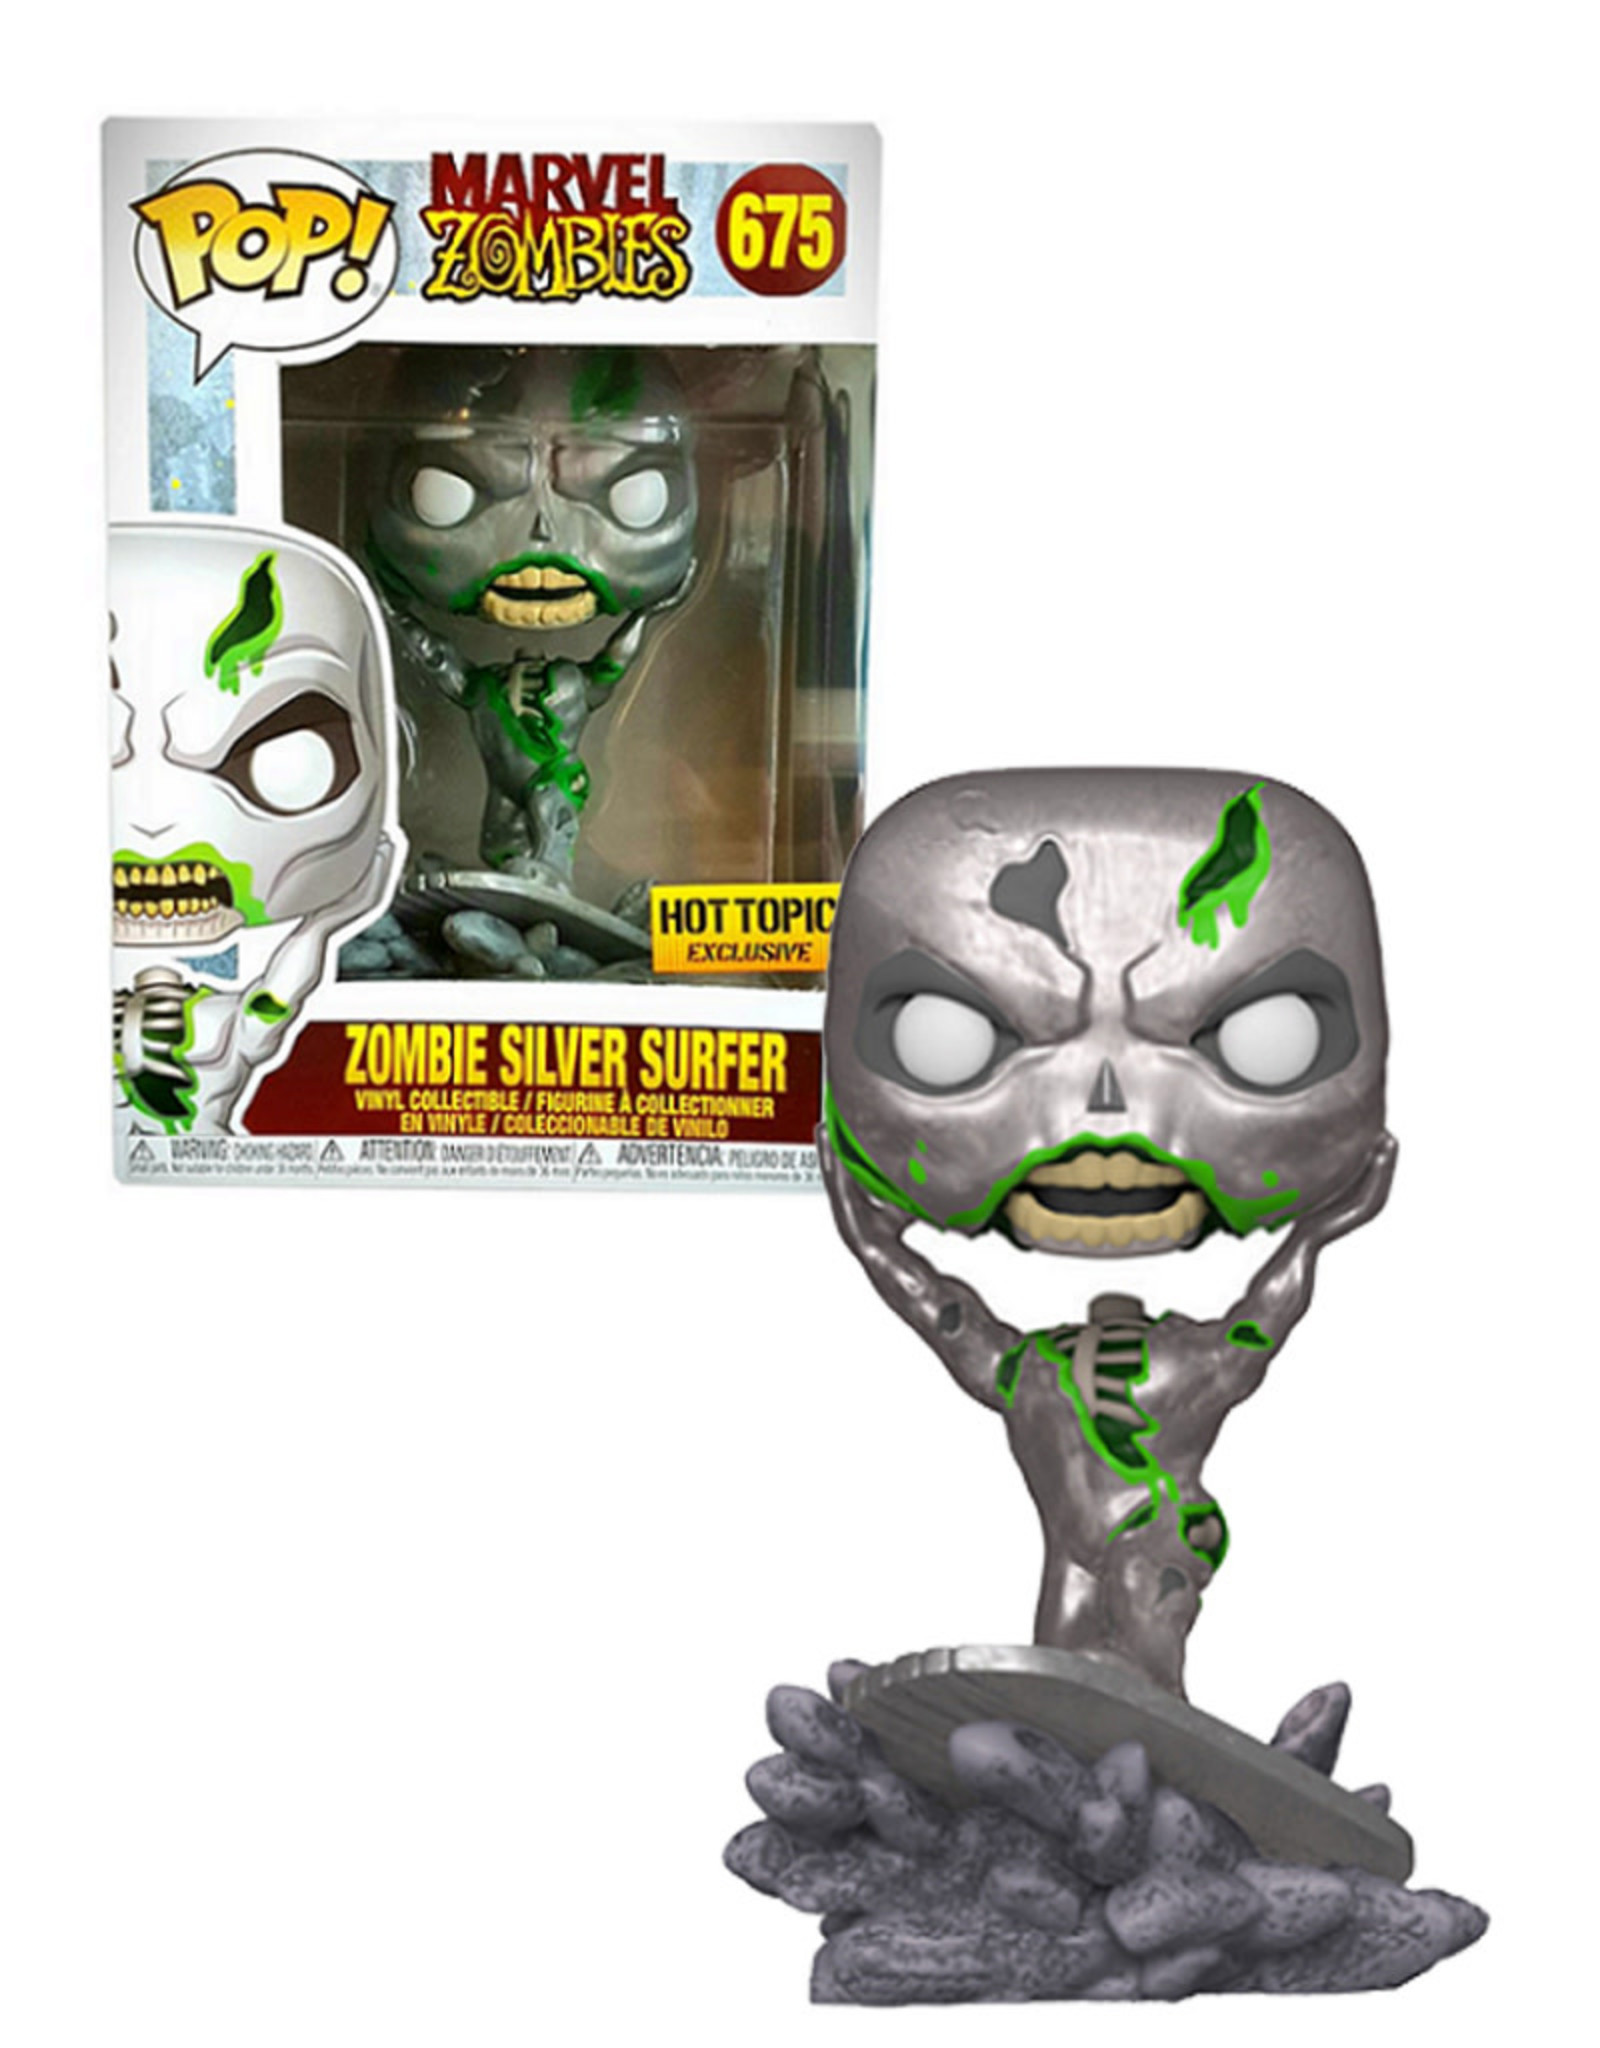 Marvel Marvel Zombies 675 ( Funko Pop ) Zombie Silver Surfer